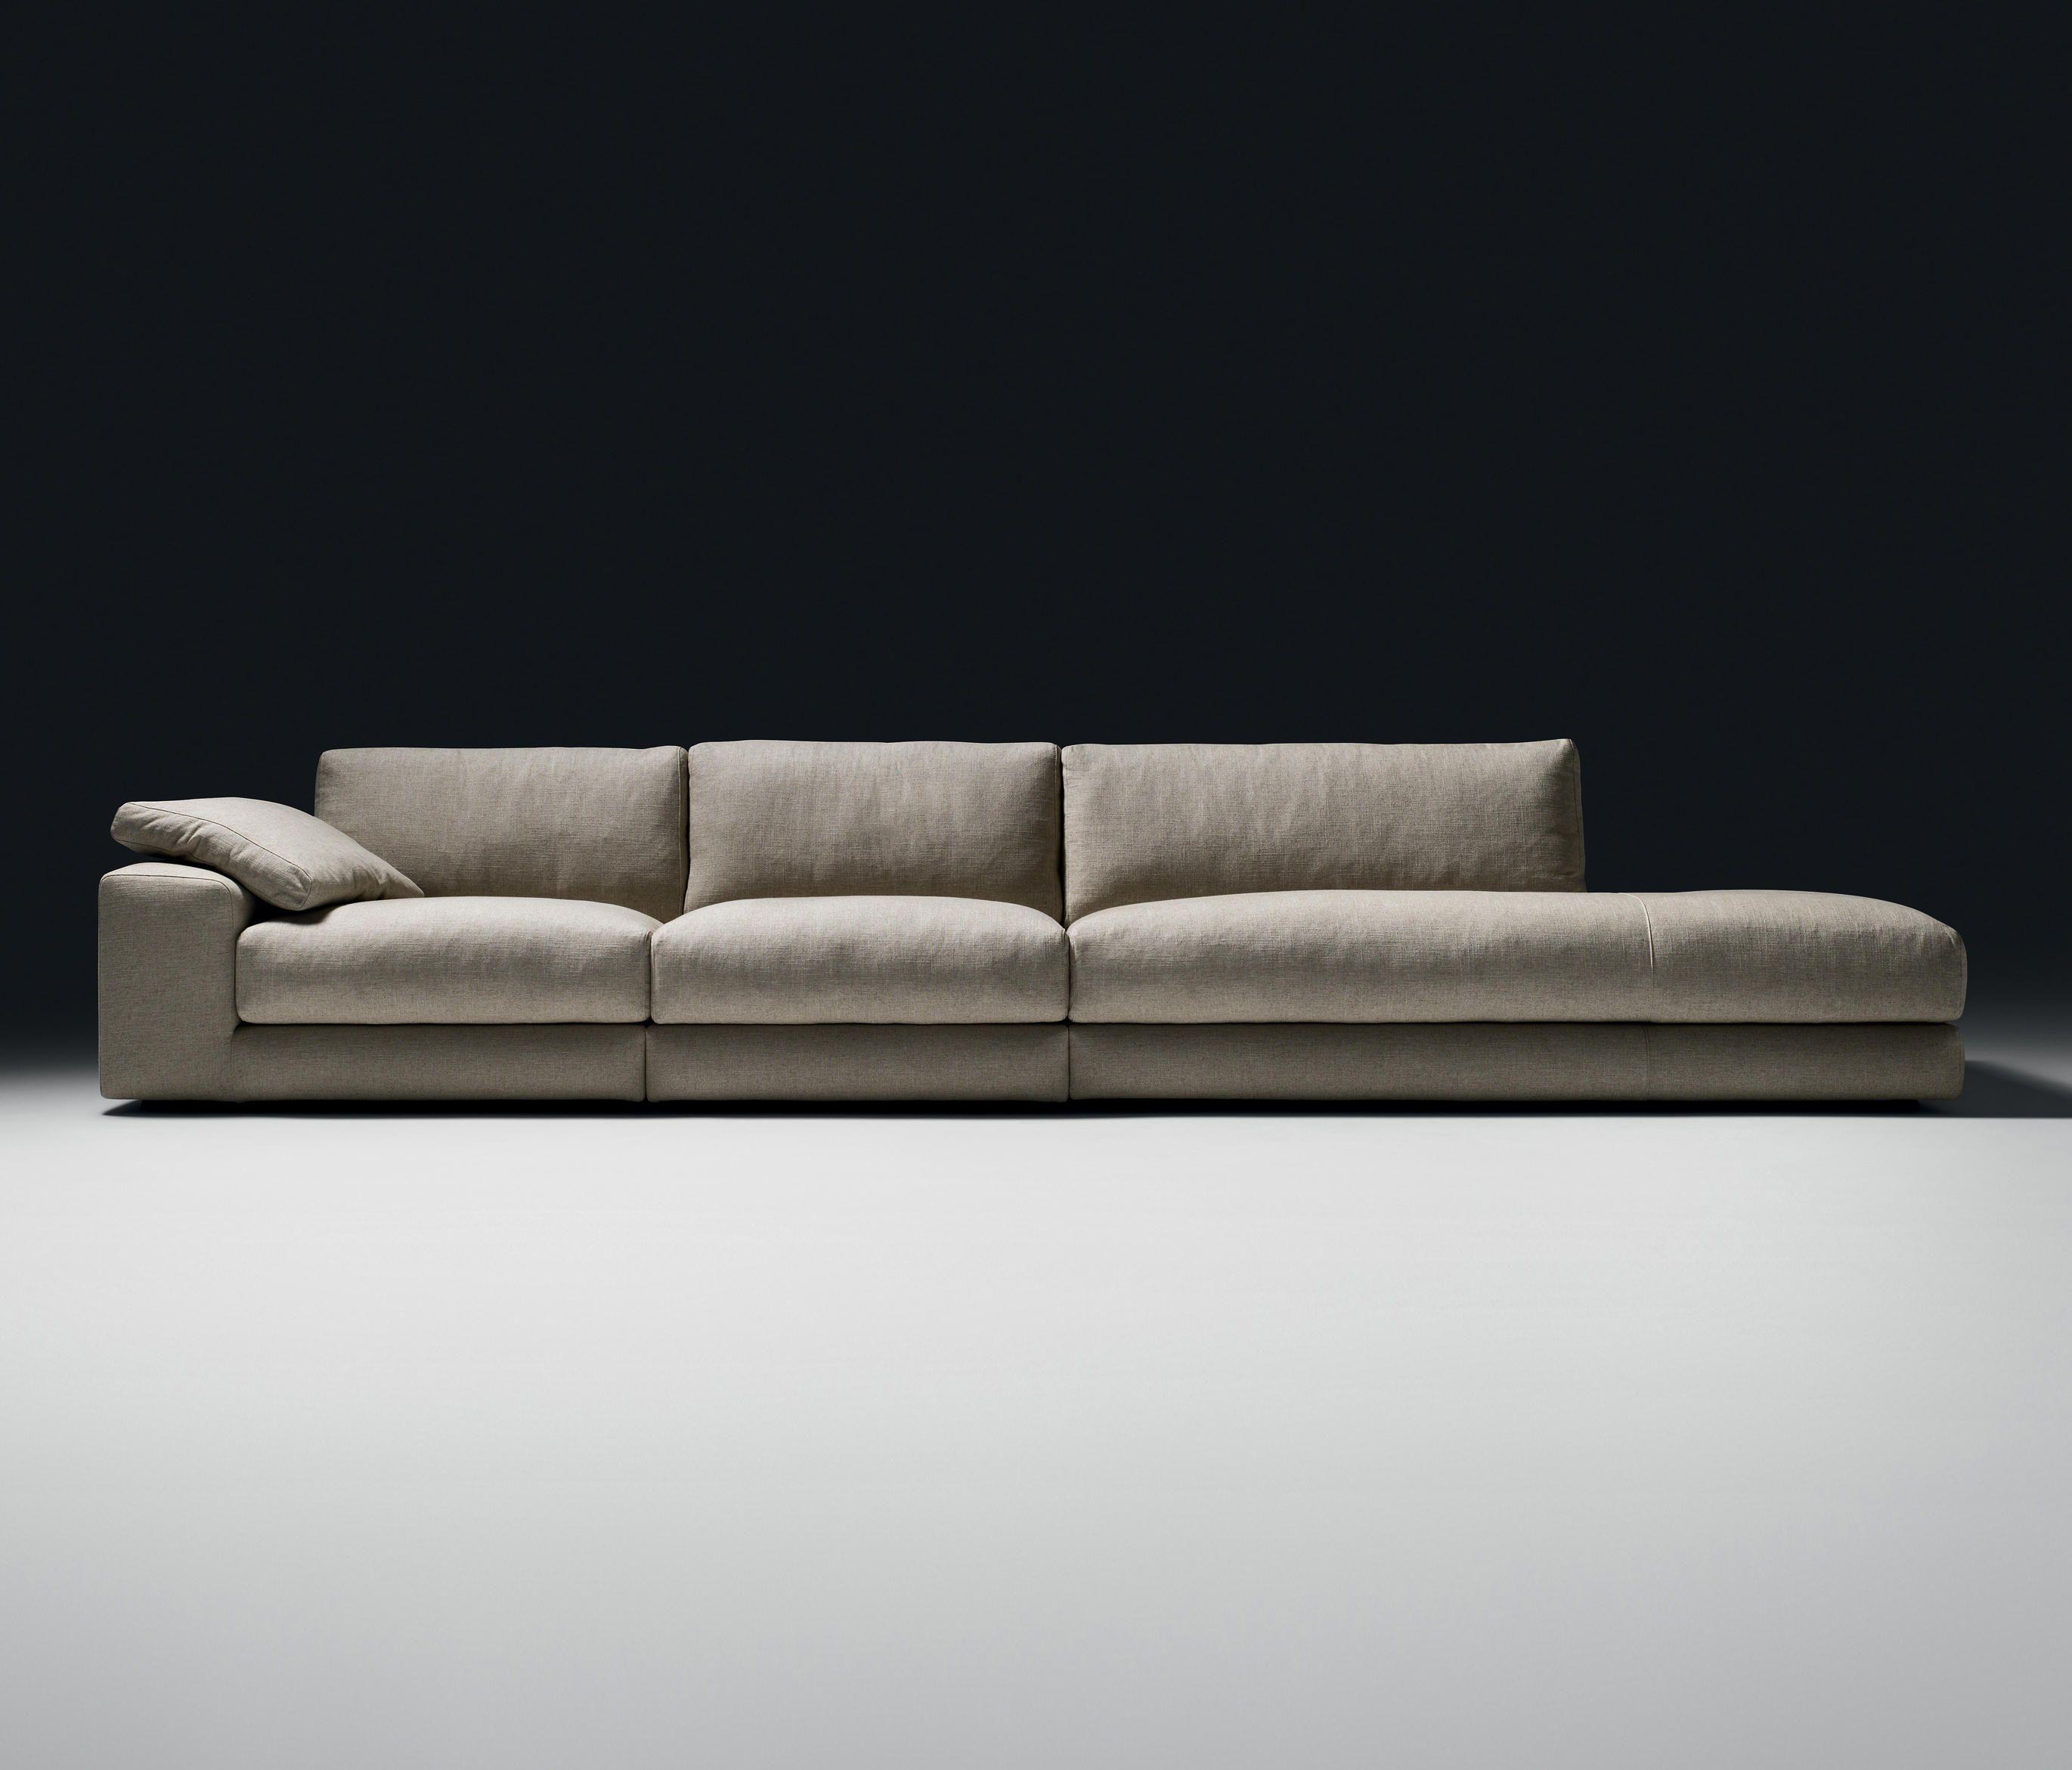 Strange Dante Sofa Von Black Tie Sofas Sofa In 2019 Sofa Alphanode Cool Chair Designs And Ideas Alphanodeonline